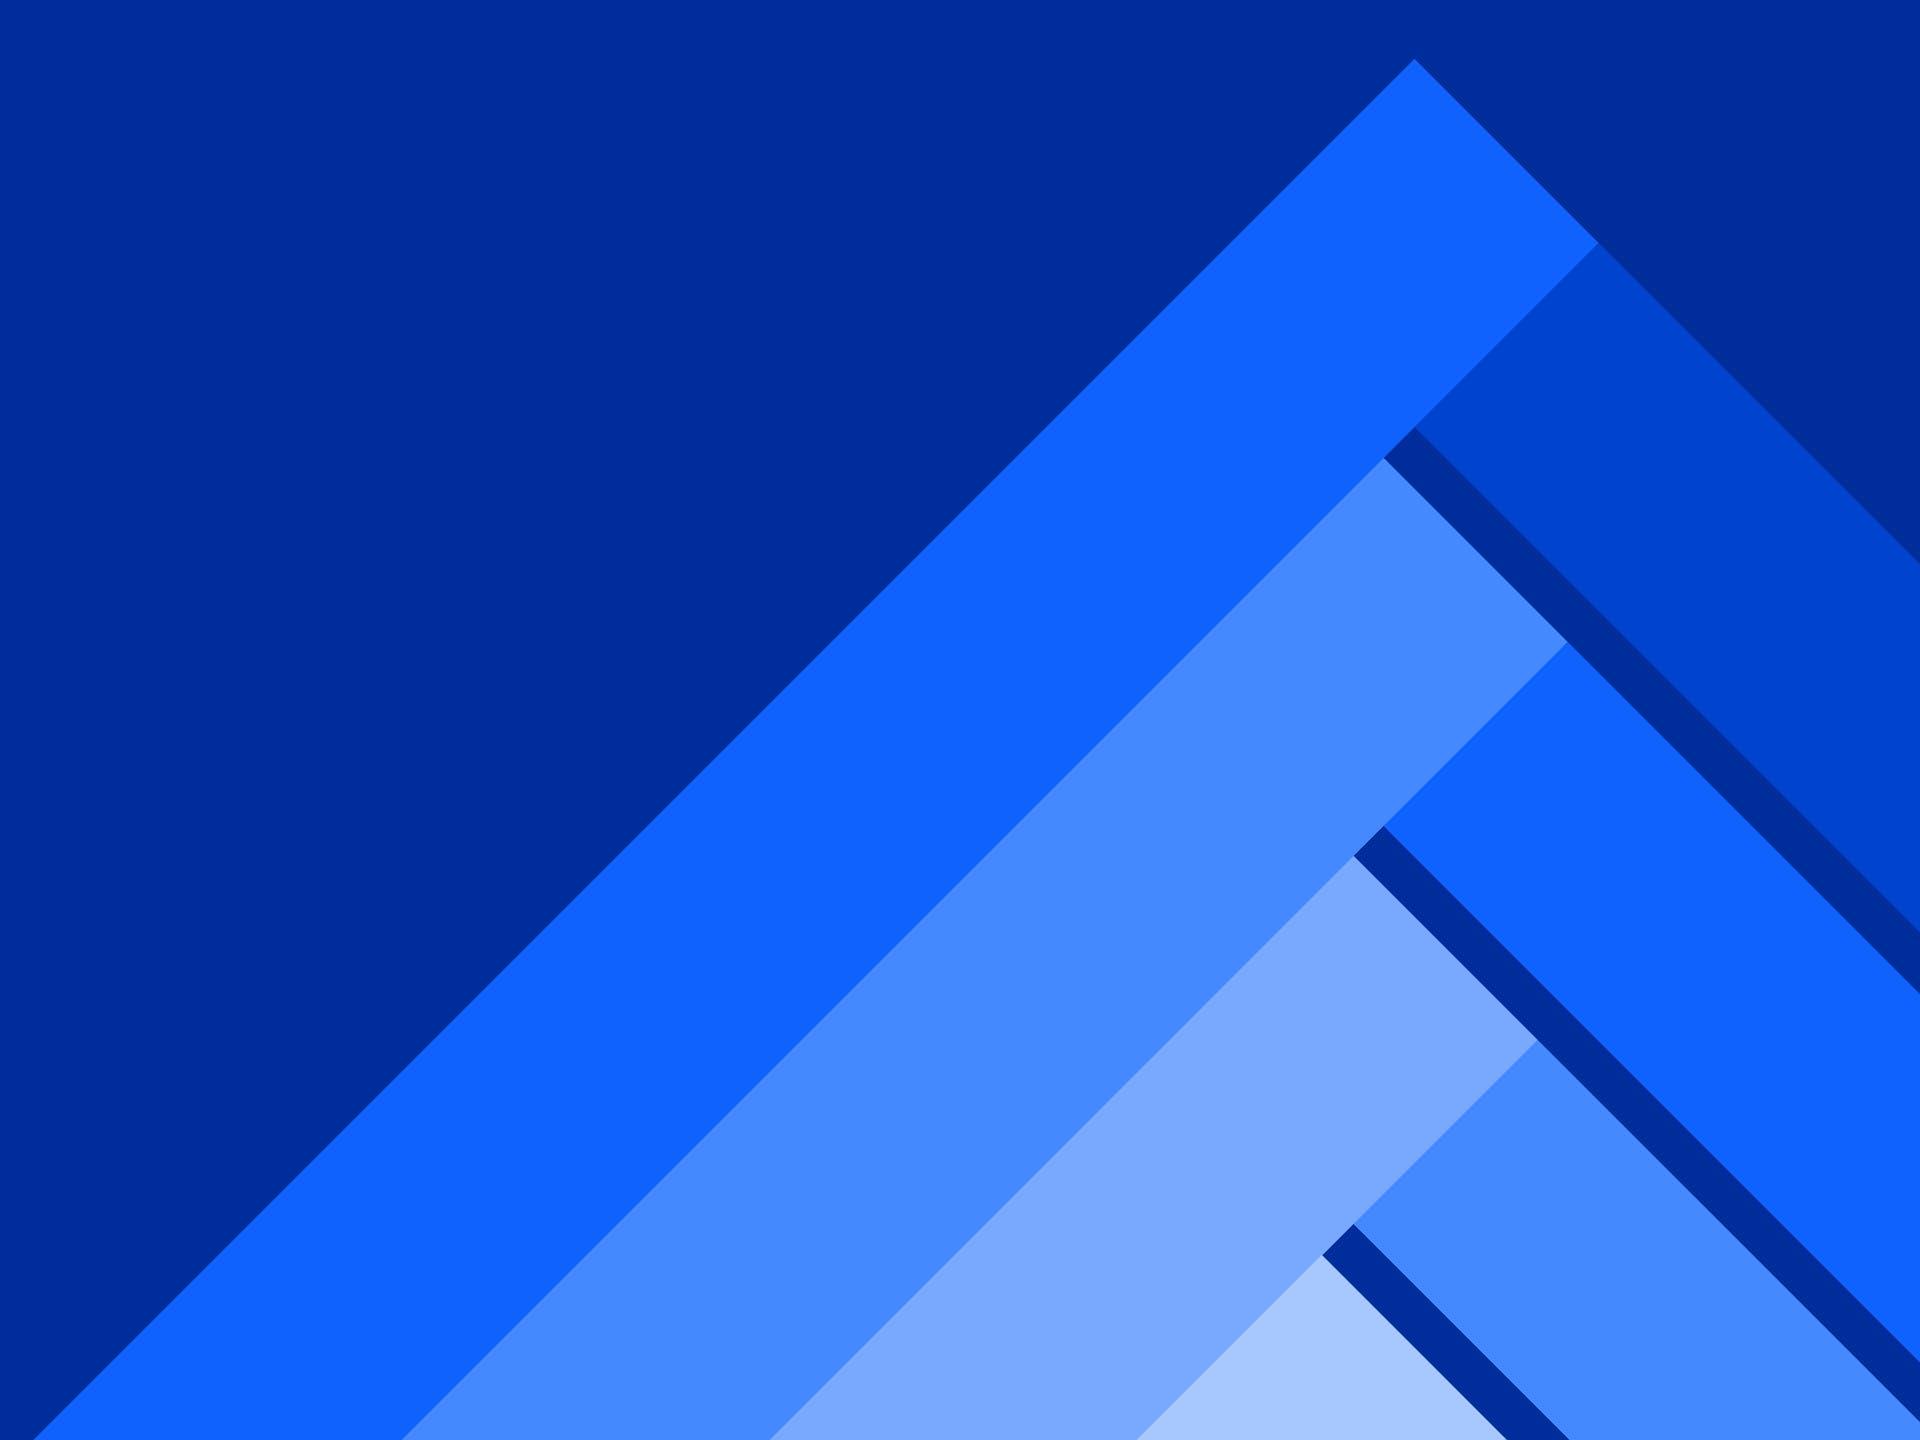 Blue layered peak